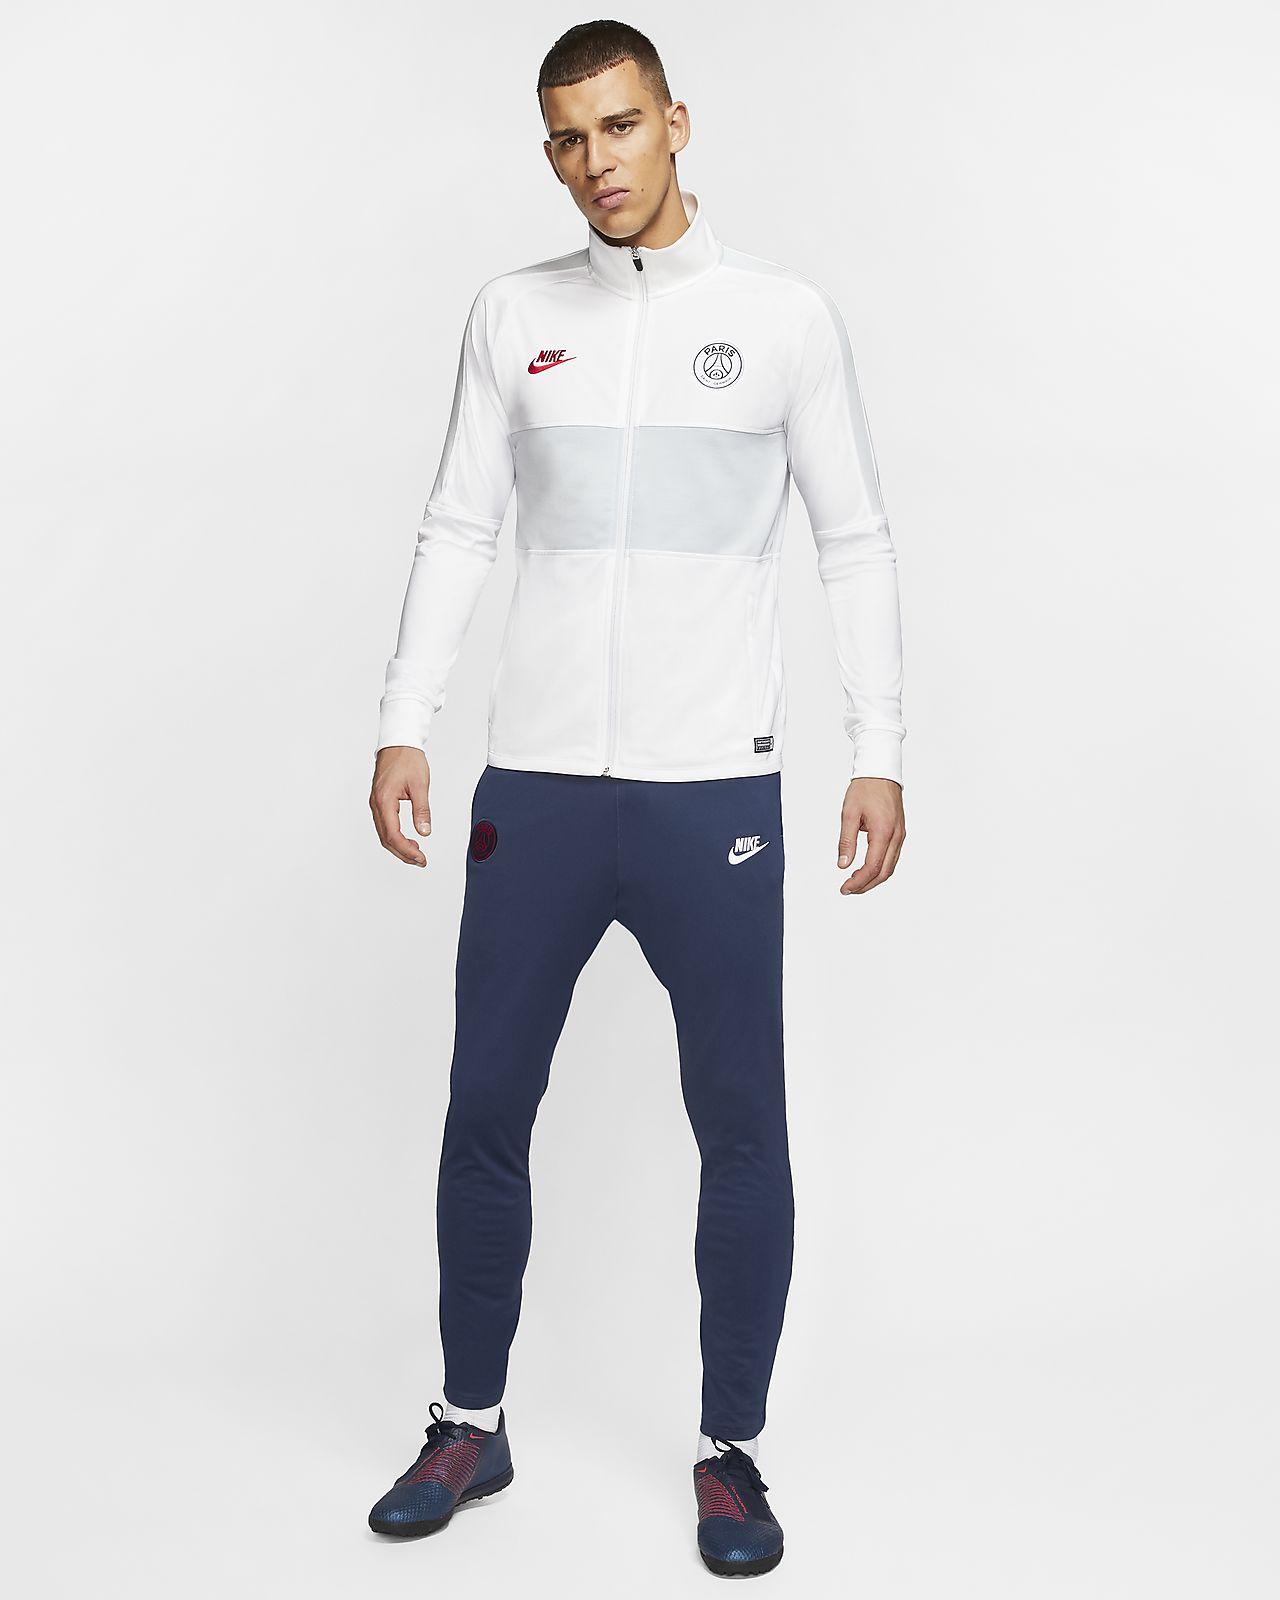 Мужской футбольный костюм Nike Dri-FIT Paris Saint-Germain Strike